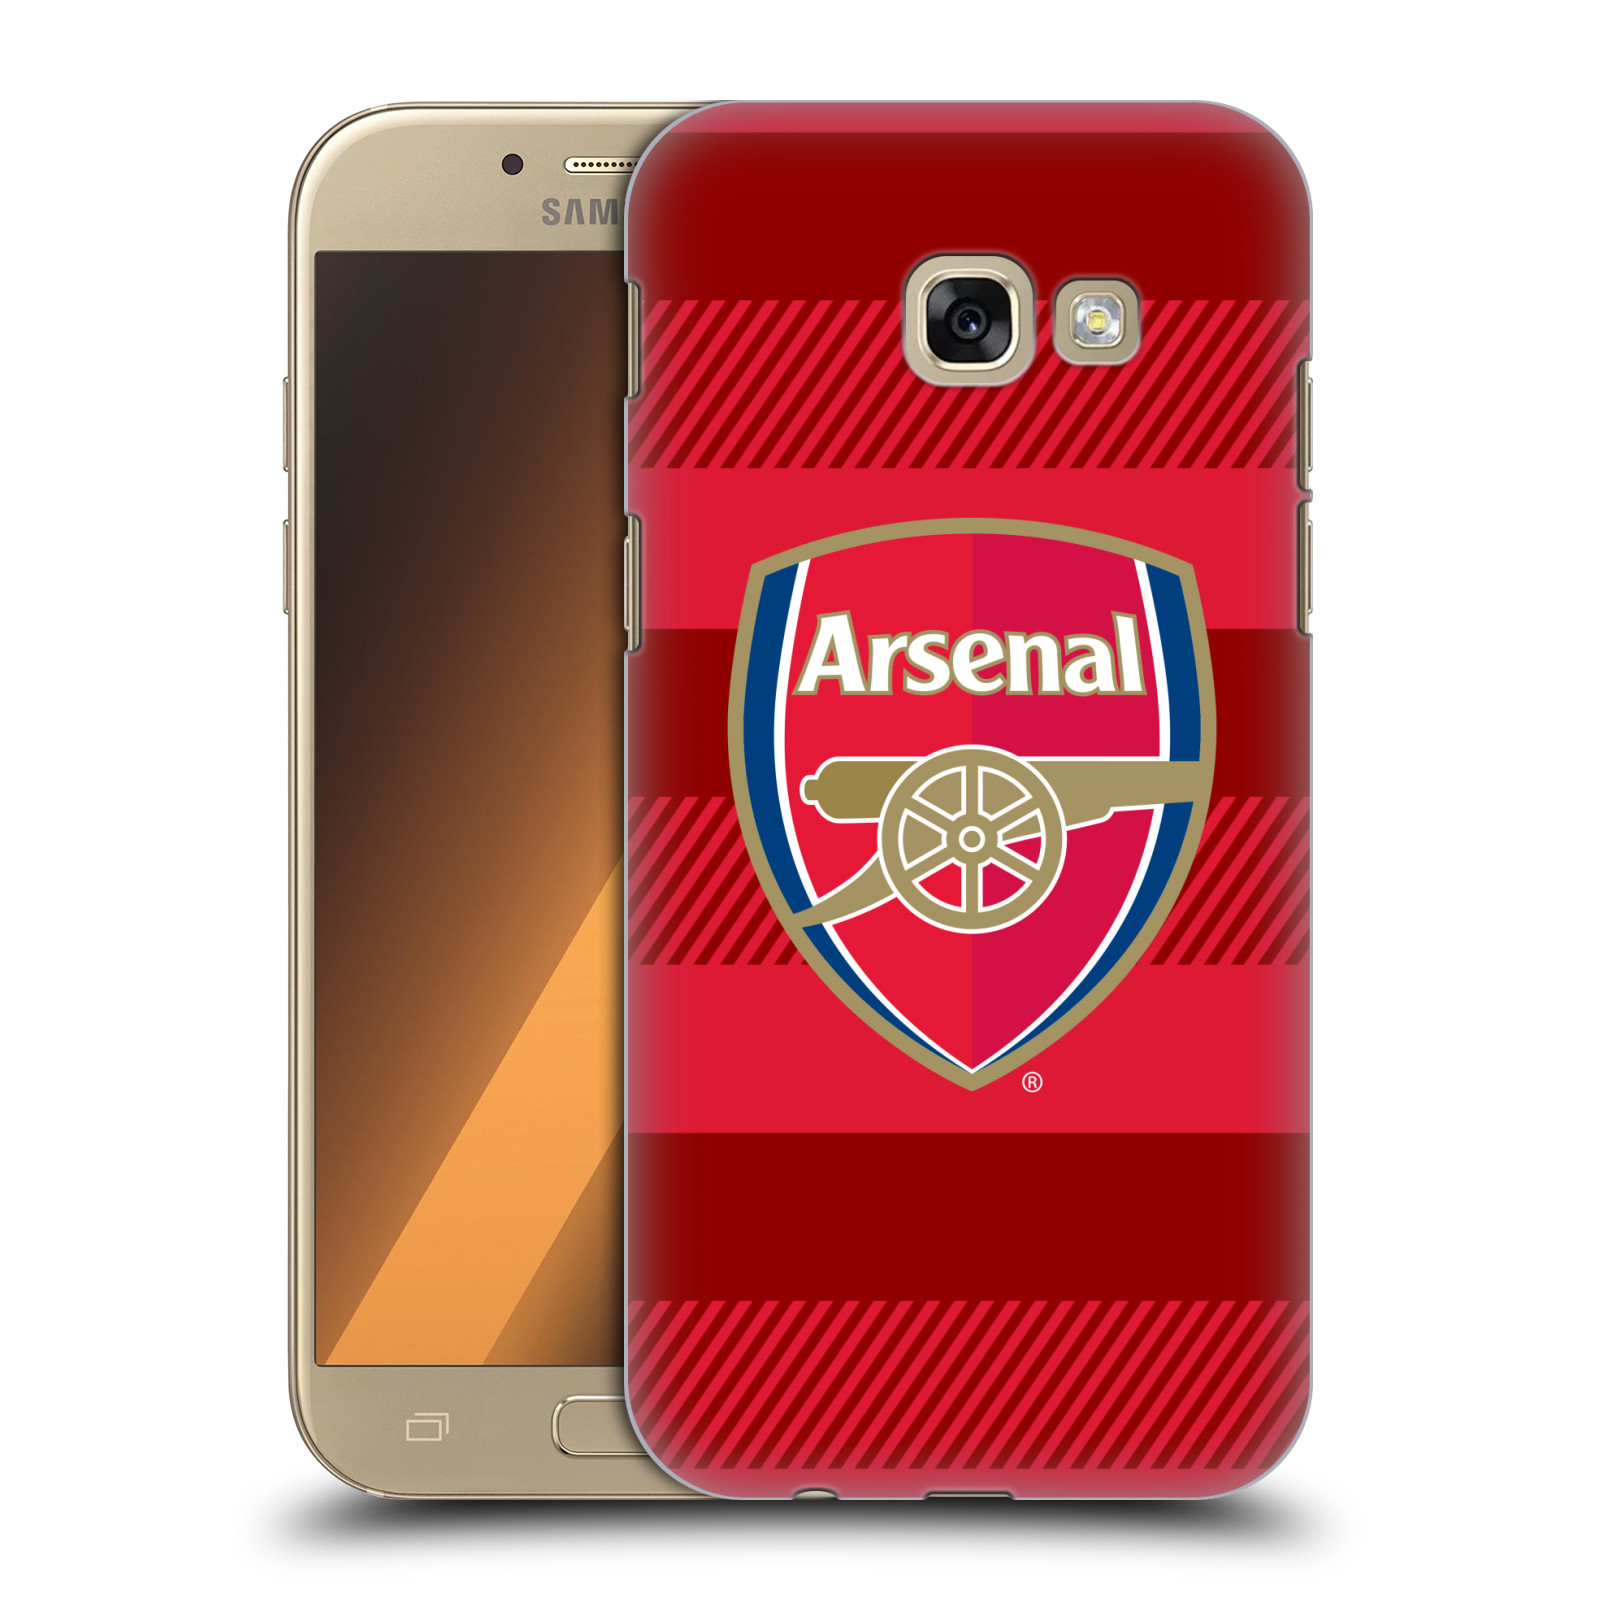 Plastové pouzdro na mobil Samsung Galaxy A5 (2017) - Head Case - Arsenal FC - Logo s pruhy